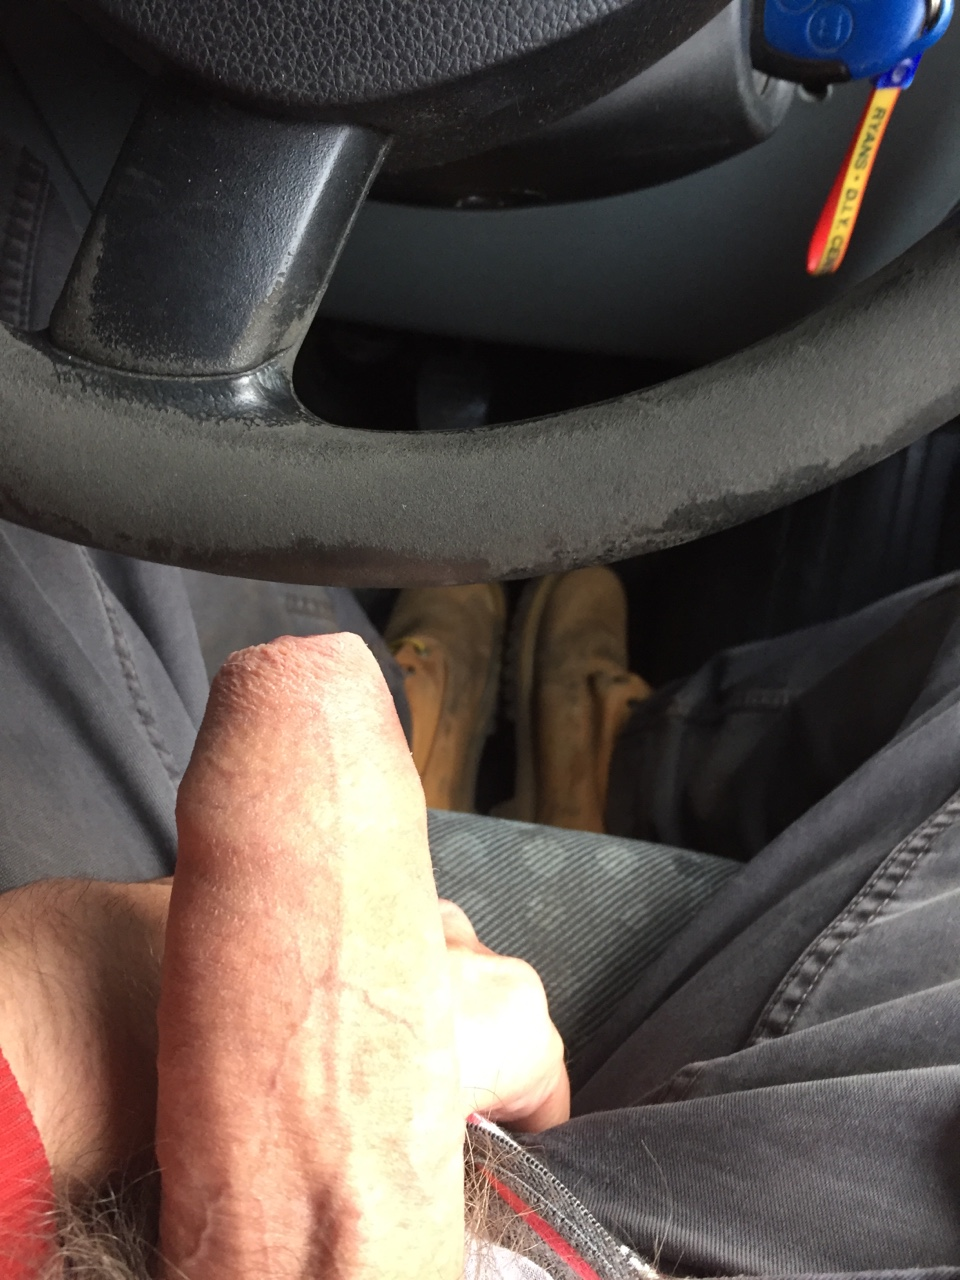 Dick Selfie On The Car-5631